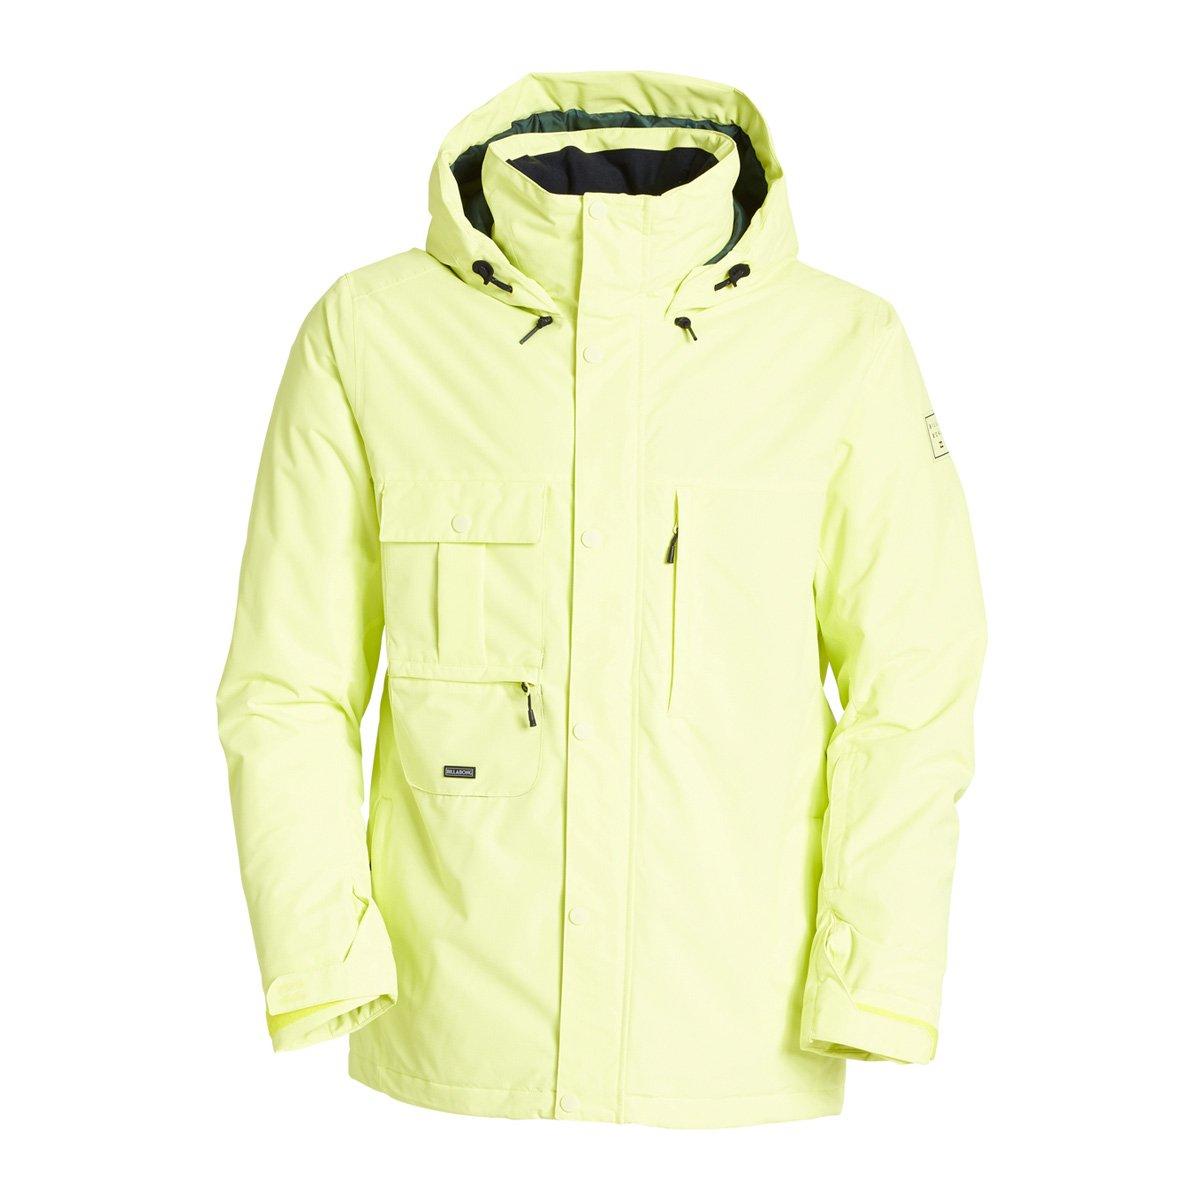 Oakley Snowboard kabát REGULATOR INSULA 2L 10K JKT 412784